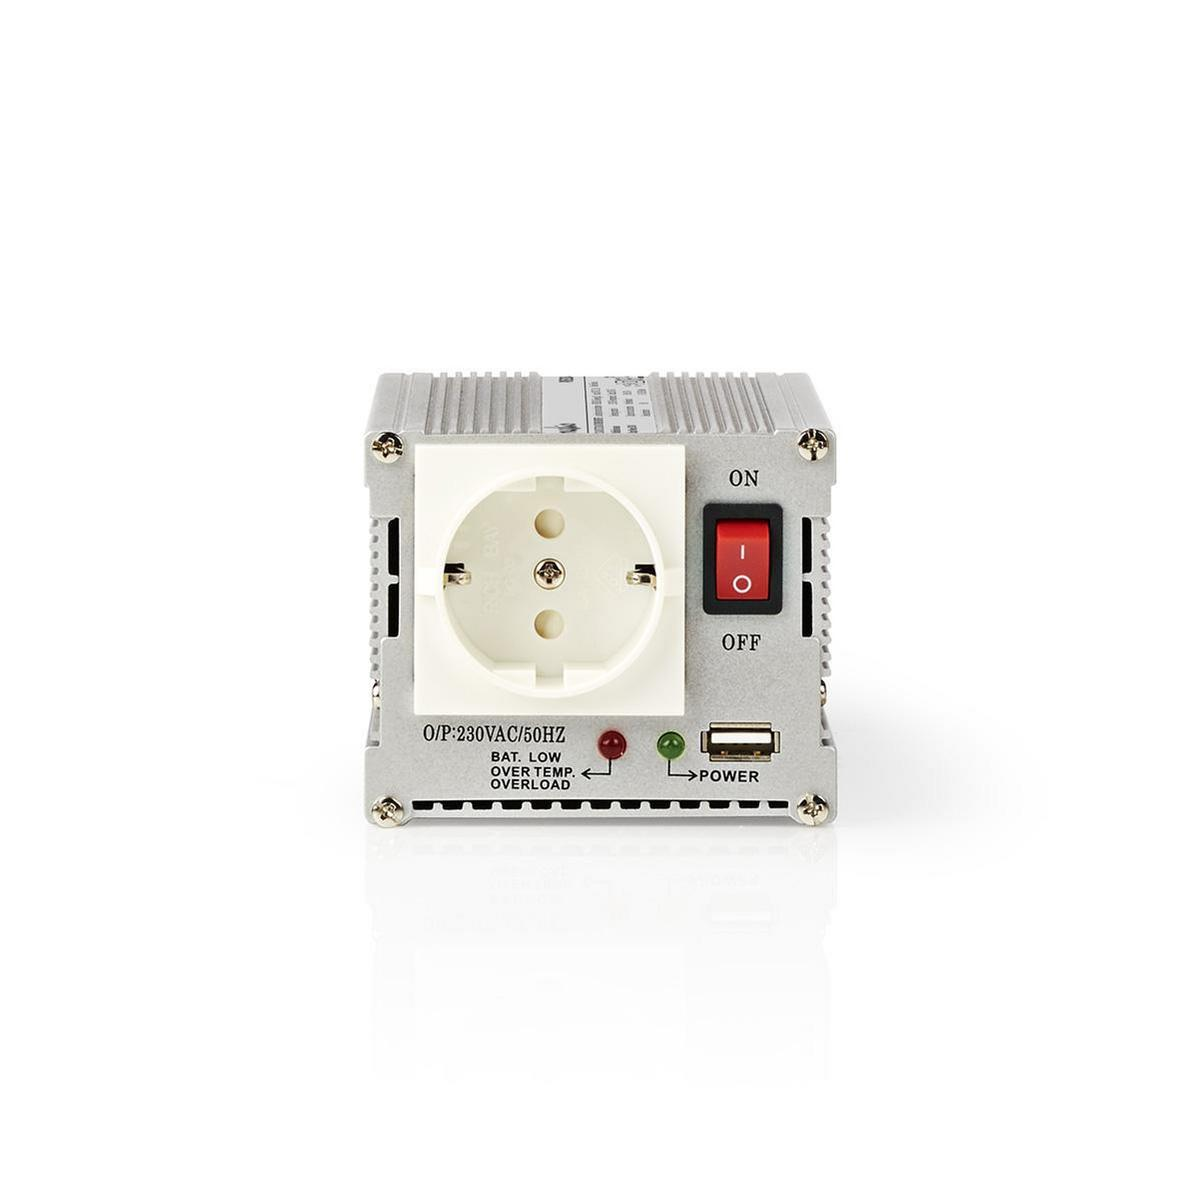 Stroomomvormer Gemodificeerde Sinusgolf   24 V DC 230 V AC   300 W   1x Schuko-1x USB-Uitgang